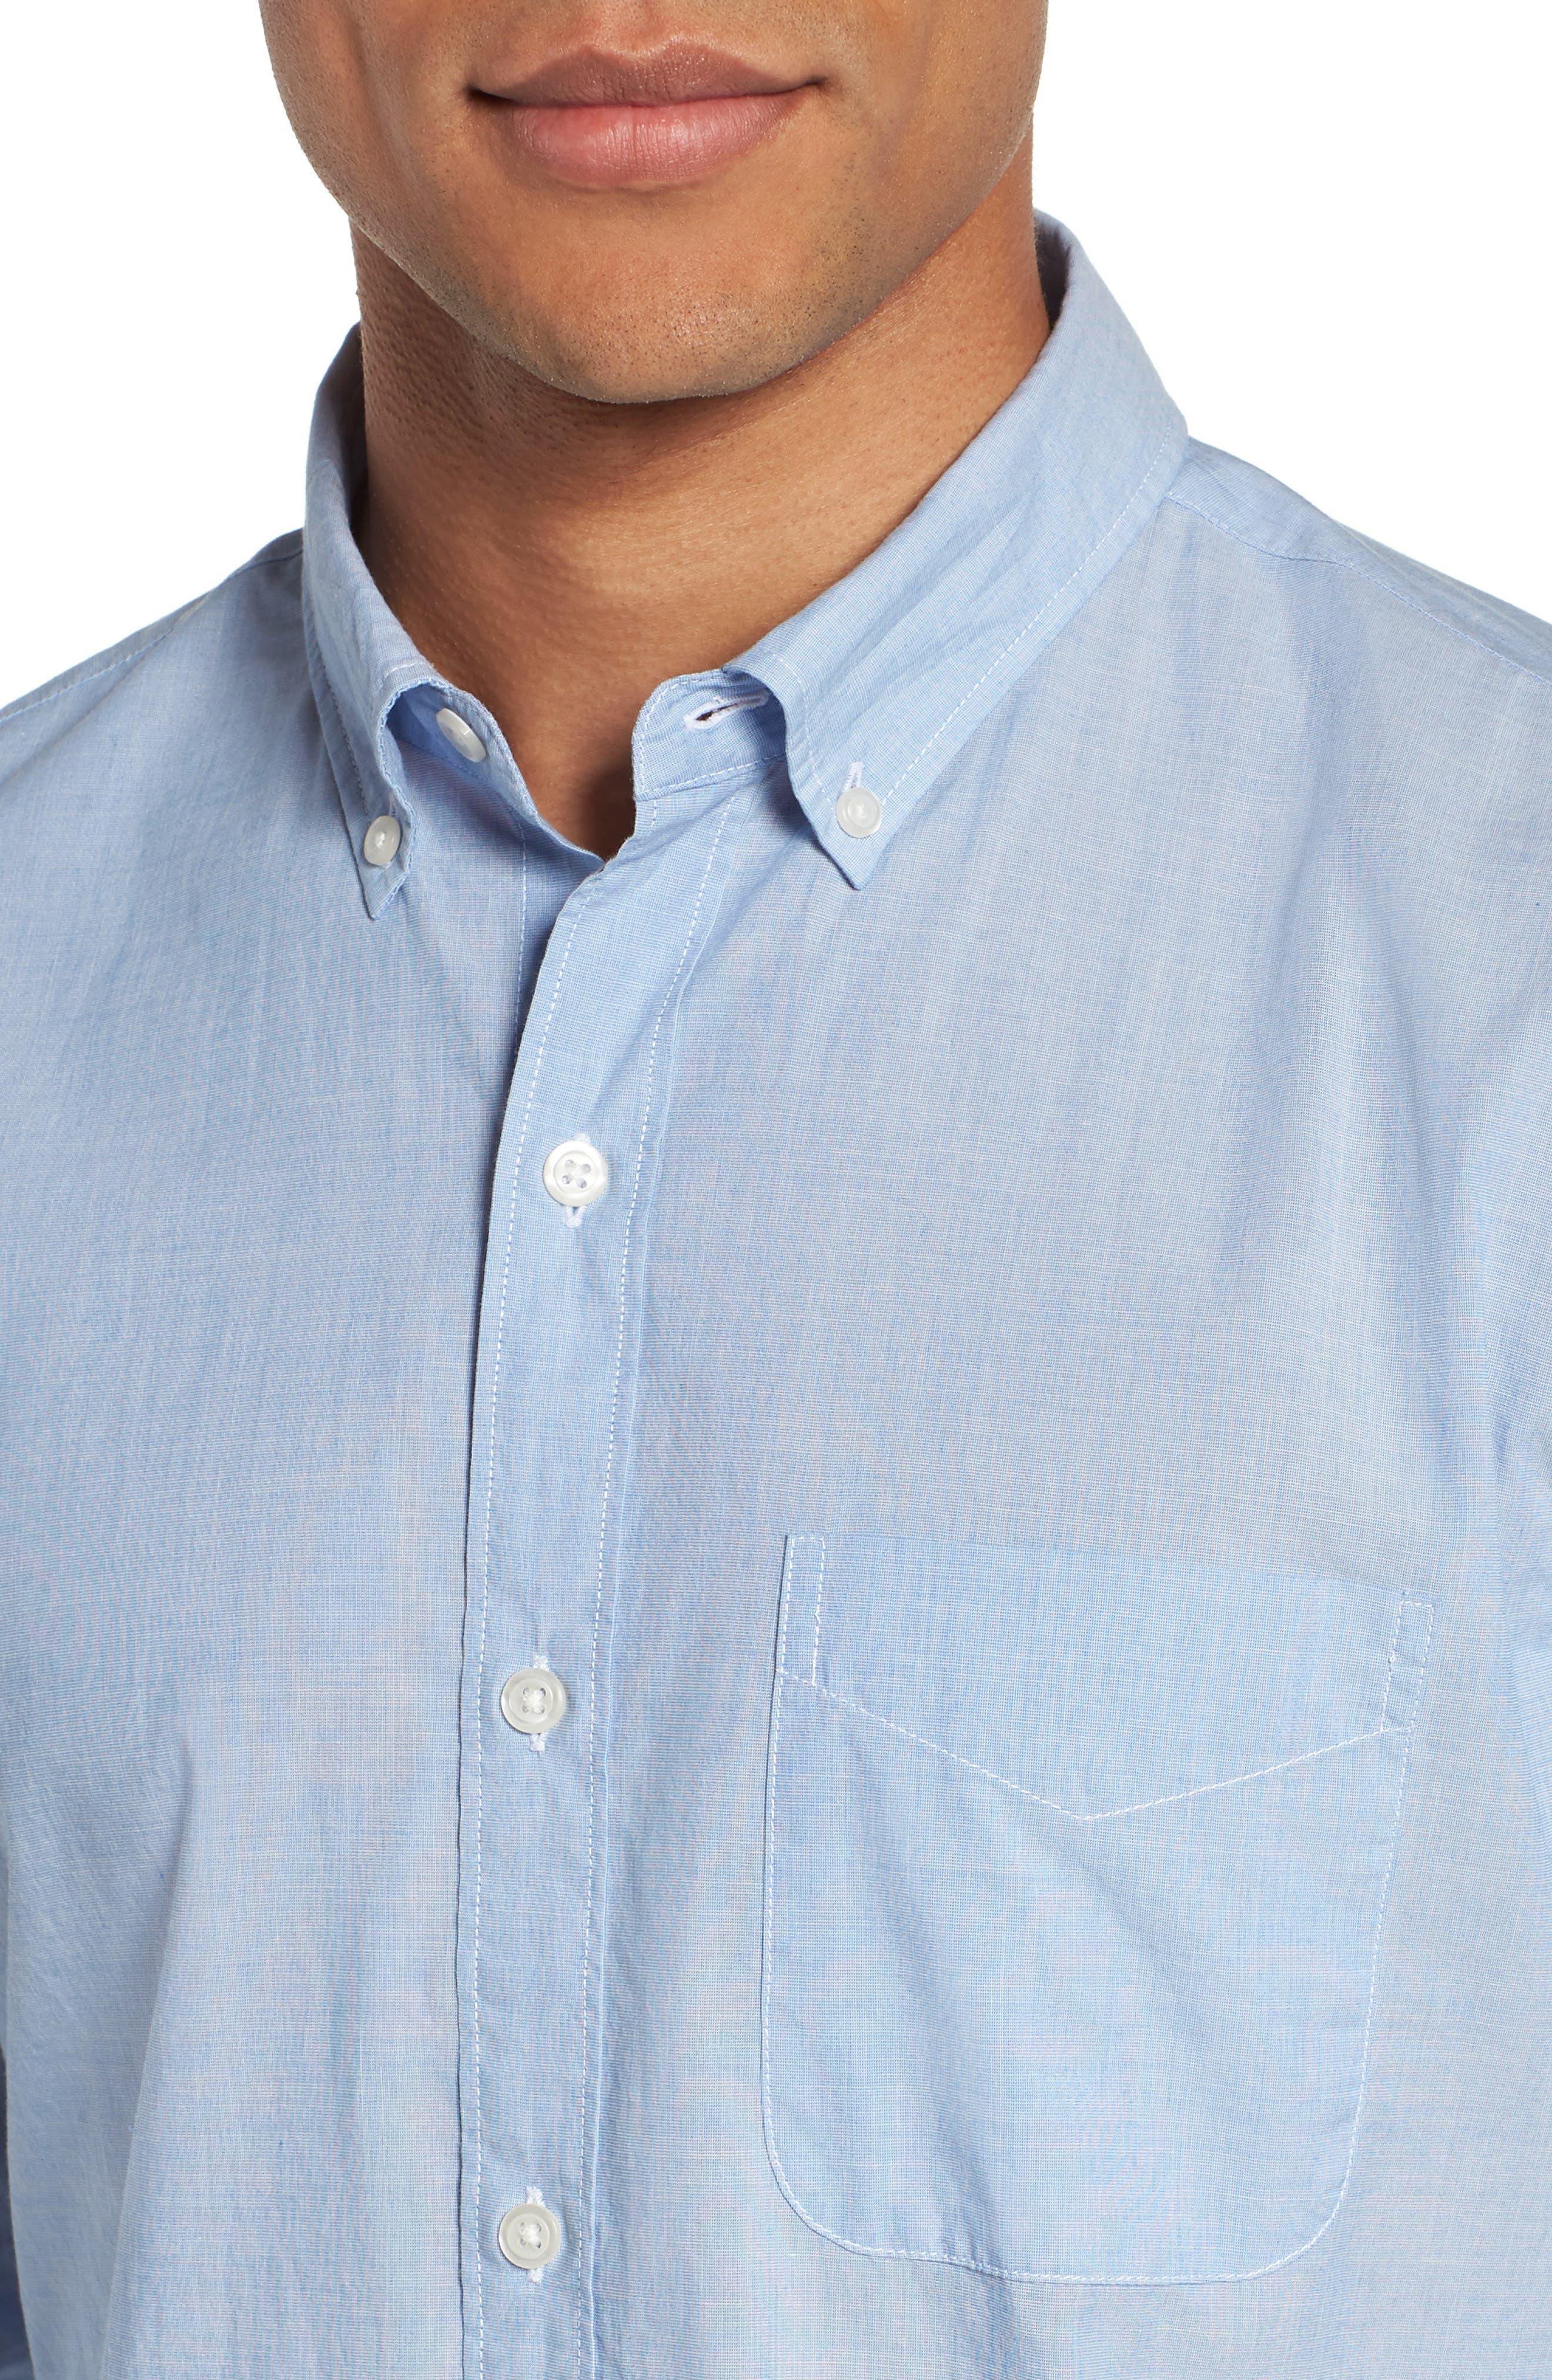 Summerweight Slim Fit Sport Shirt,                             Alternate thumbnail 2, color,                             Rip Curl